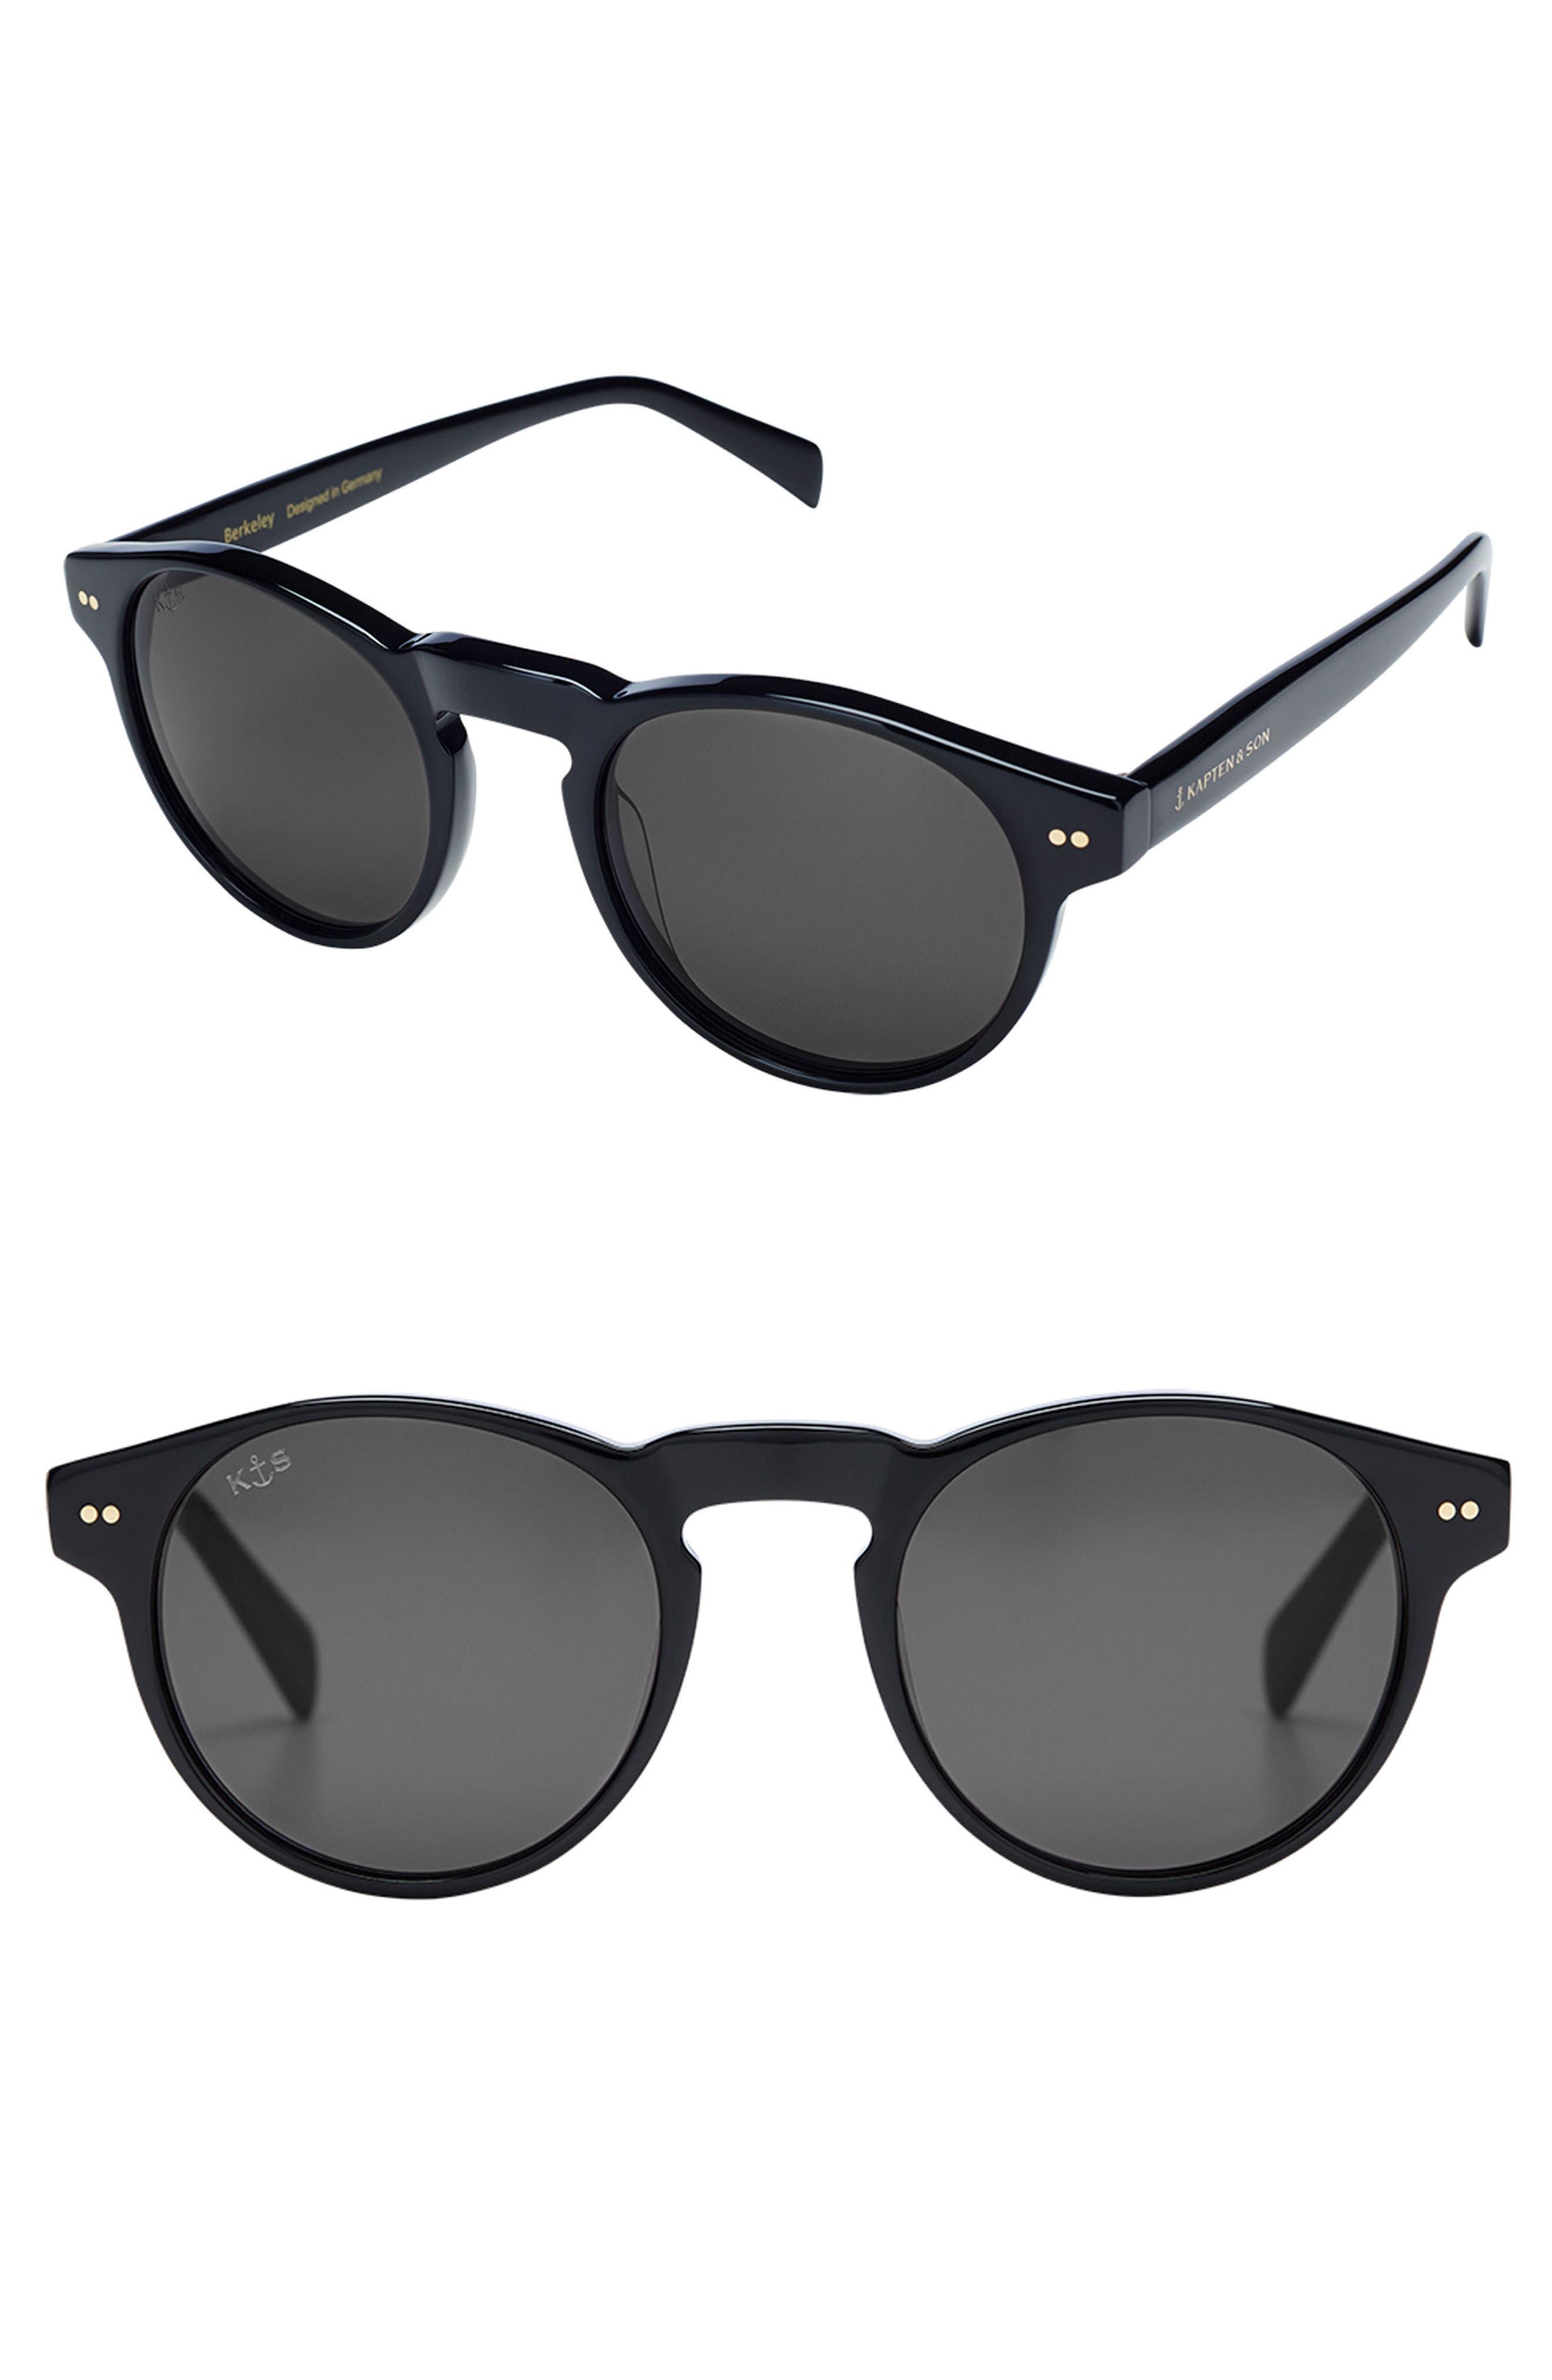 Kapten & Son Berkley 48mm Sunglasses